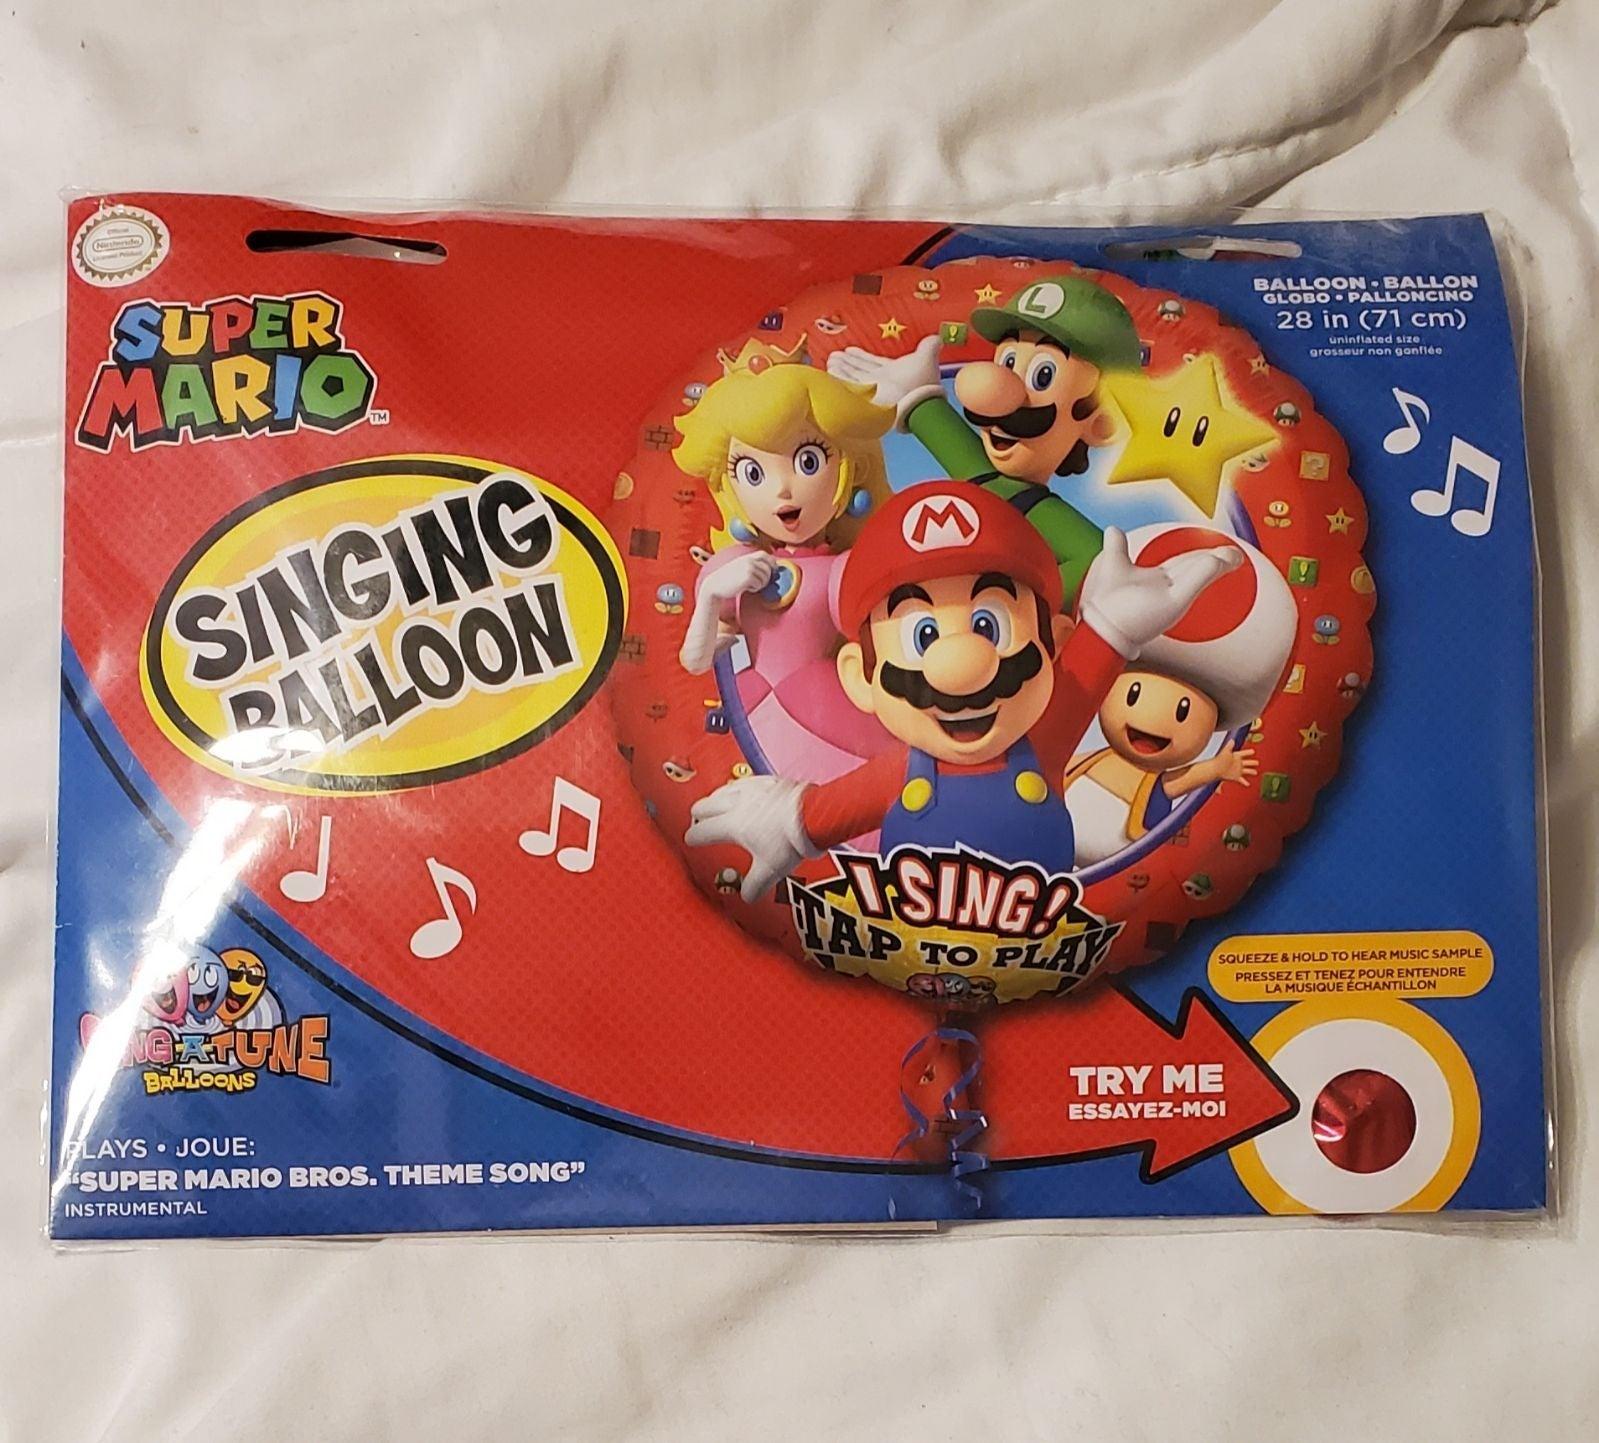 Super Mario Brothers singing balloon